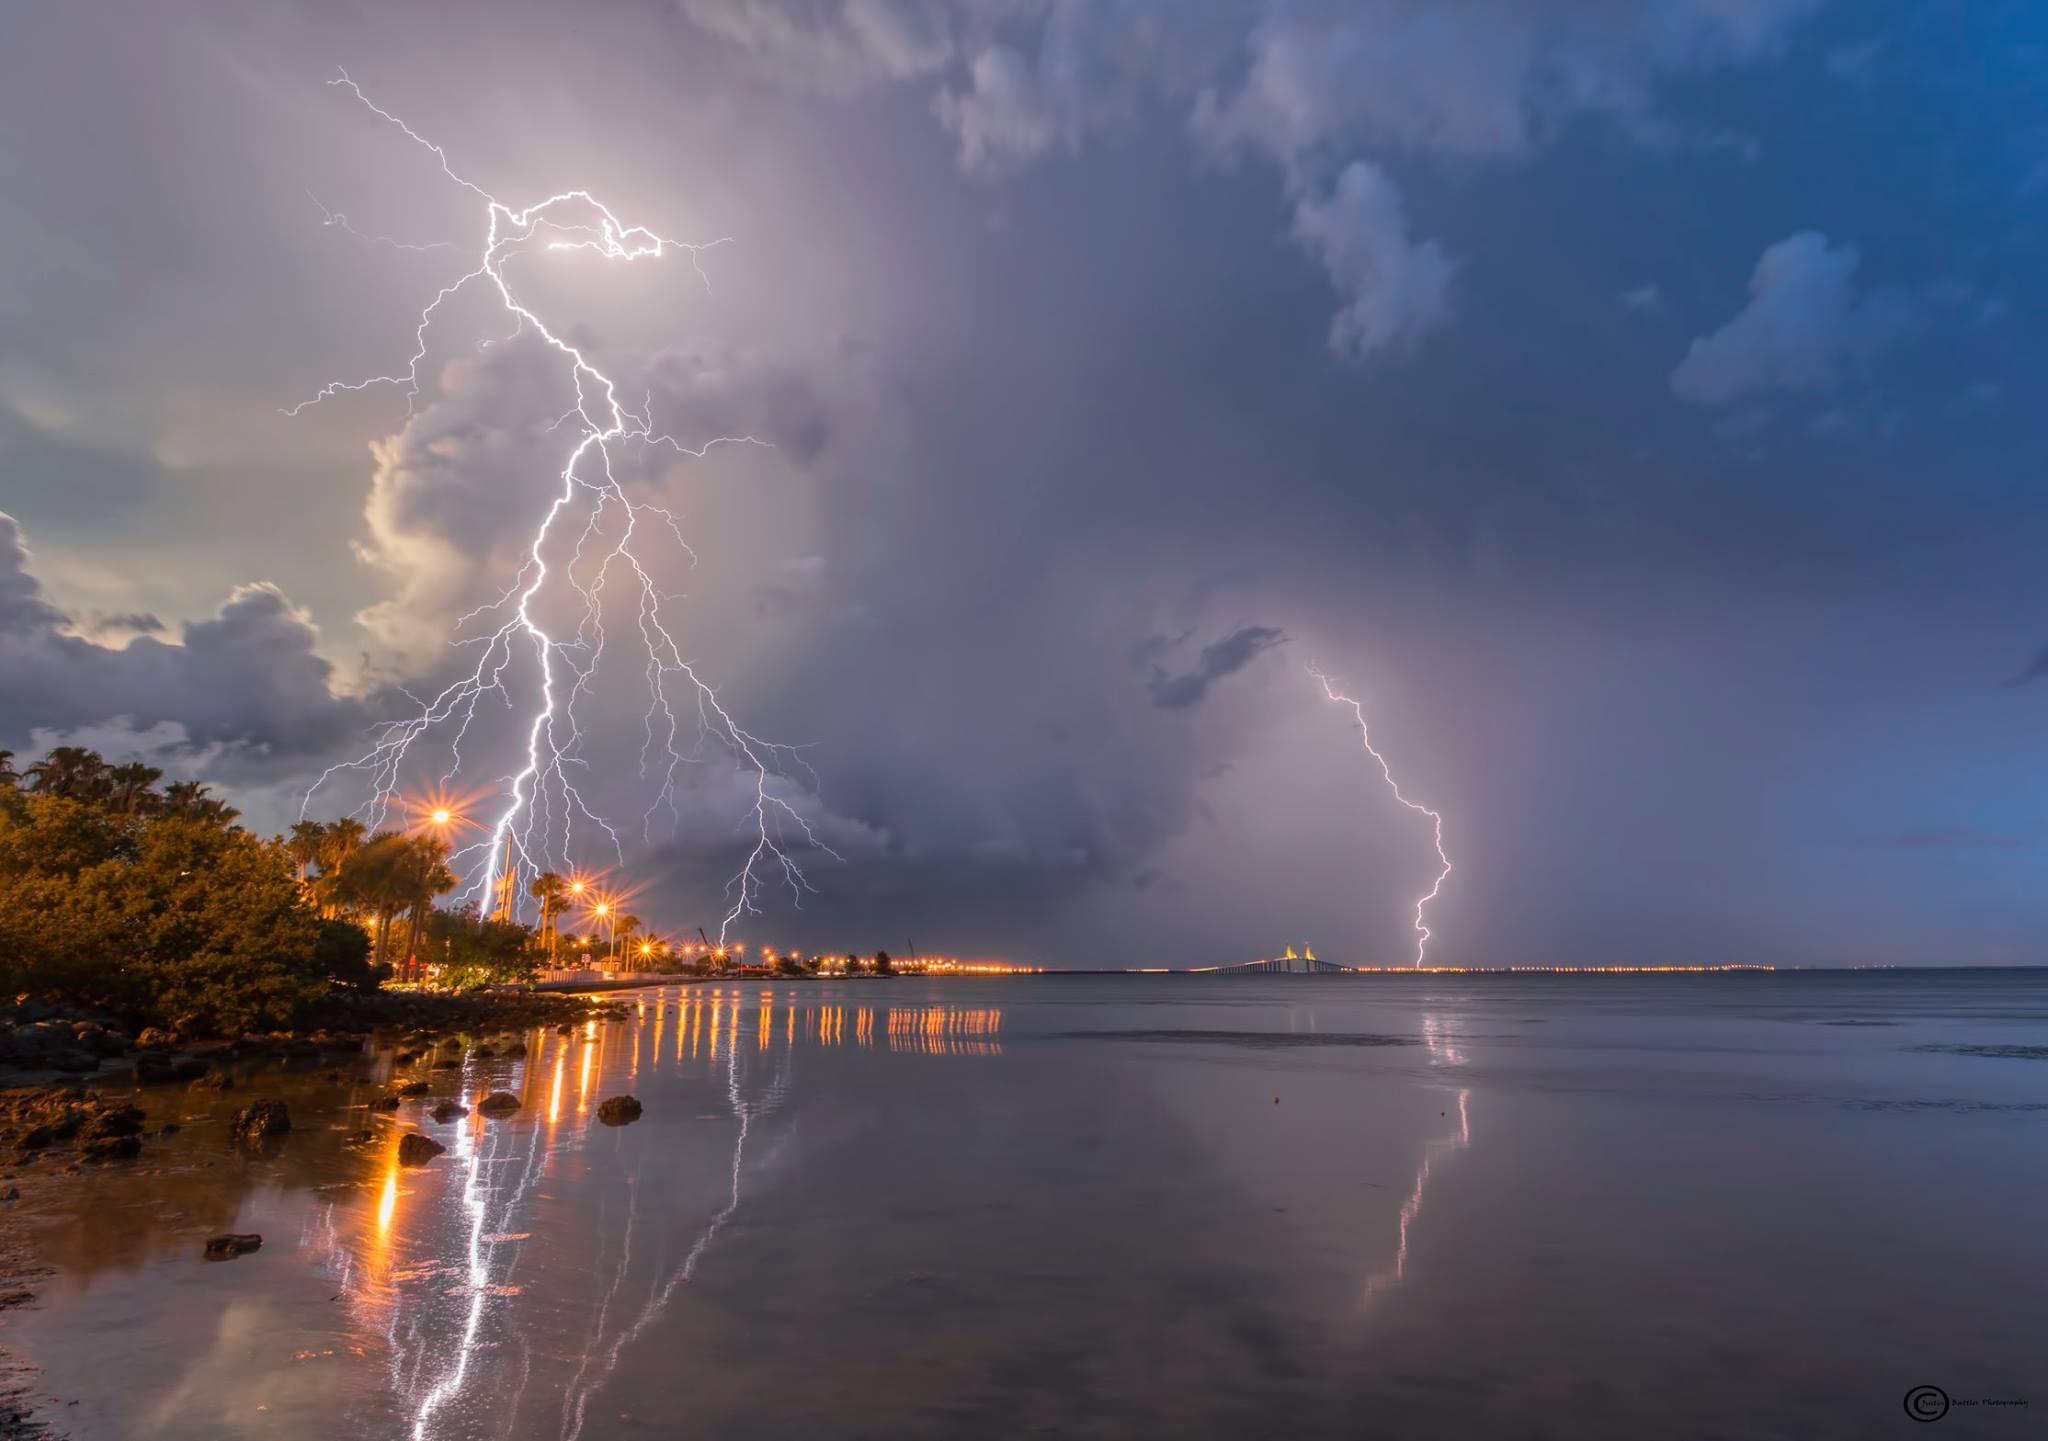 lightning picture, best lightning picture, incredible lightning picture, lightning picture justin battles, lightning picture florida, lightning picture florida july 2016